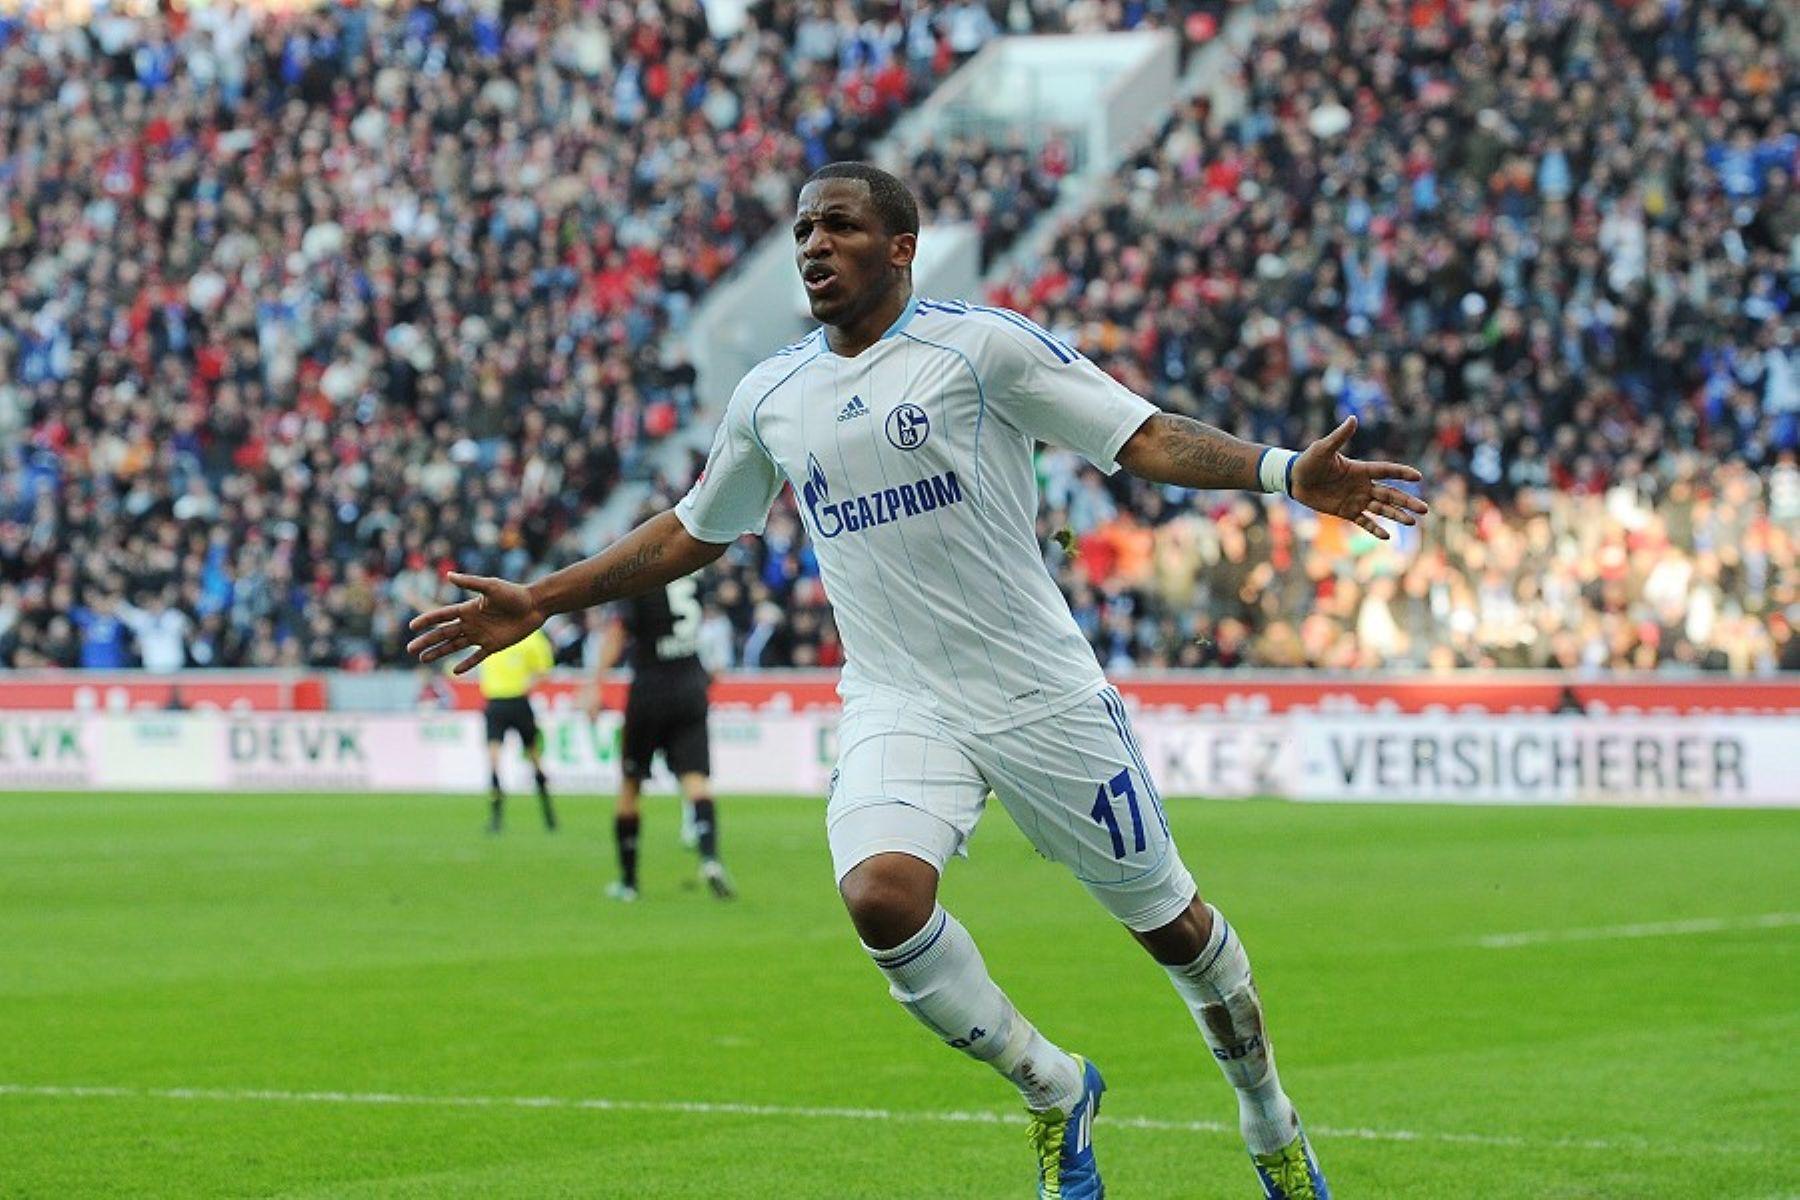 Jefferson Farfán celebra el gol al Bayer Leverkusen. Foto: Schalke04.com.